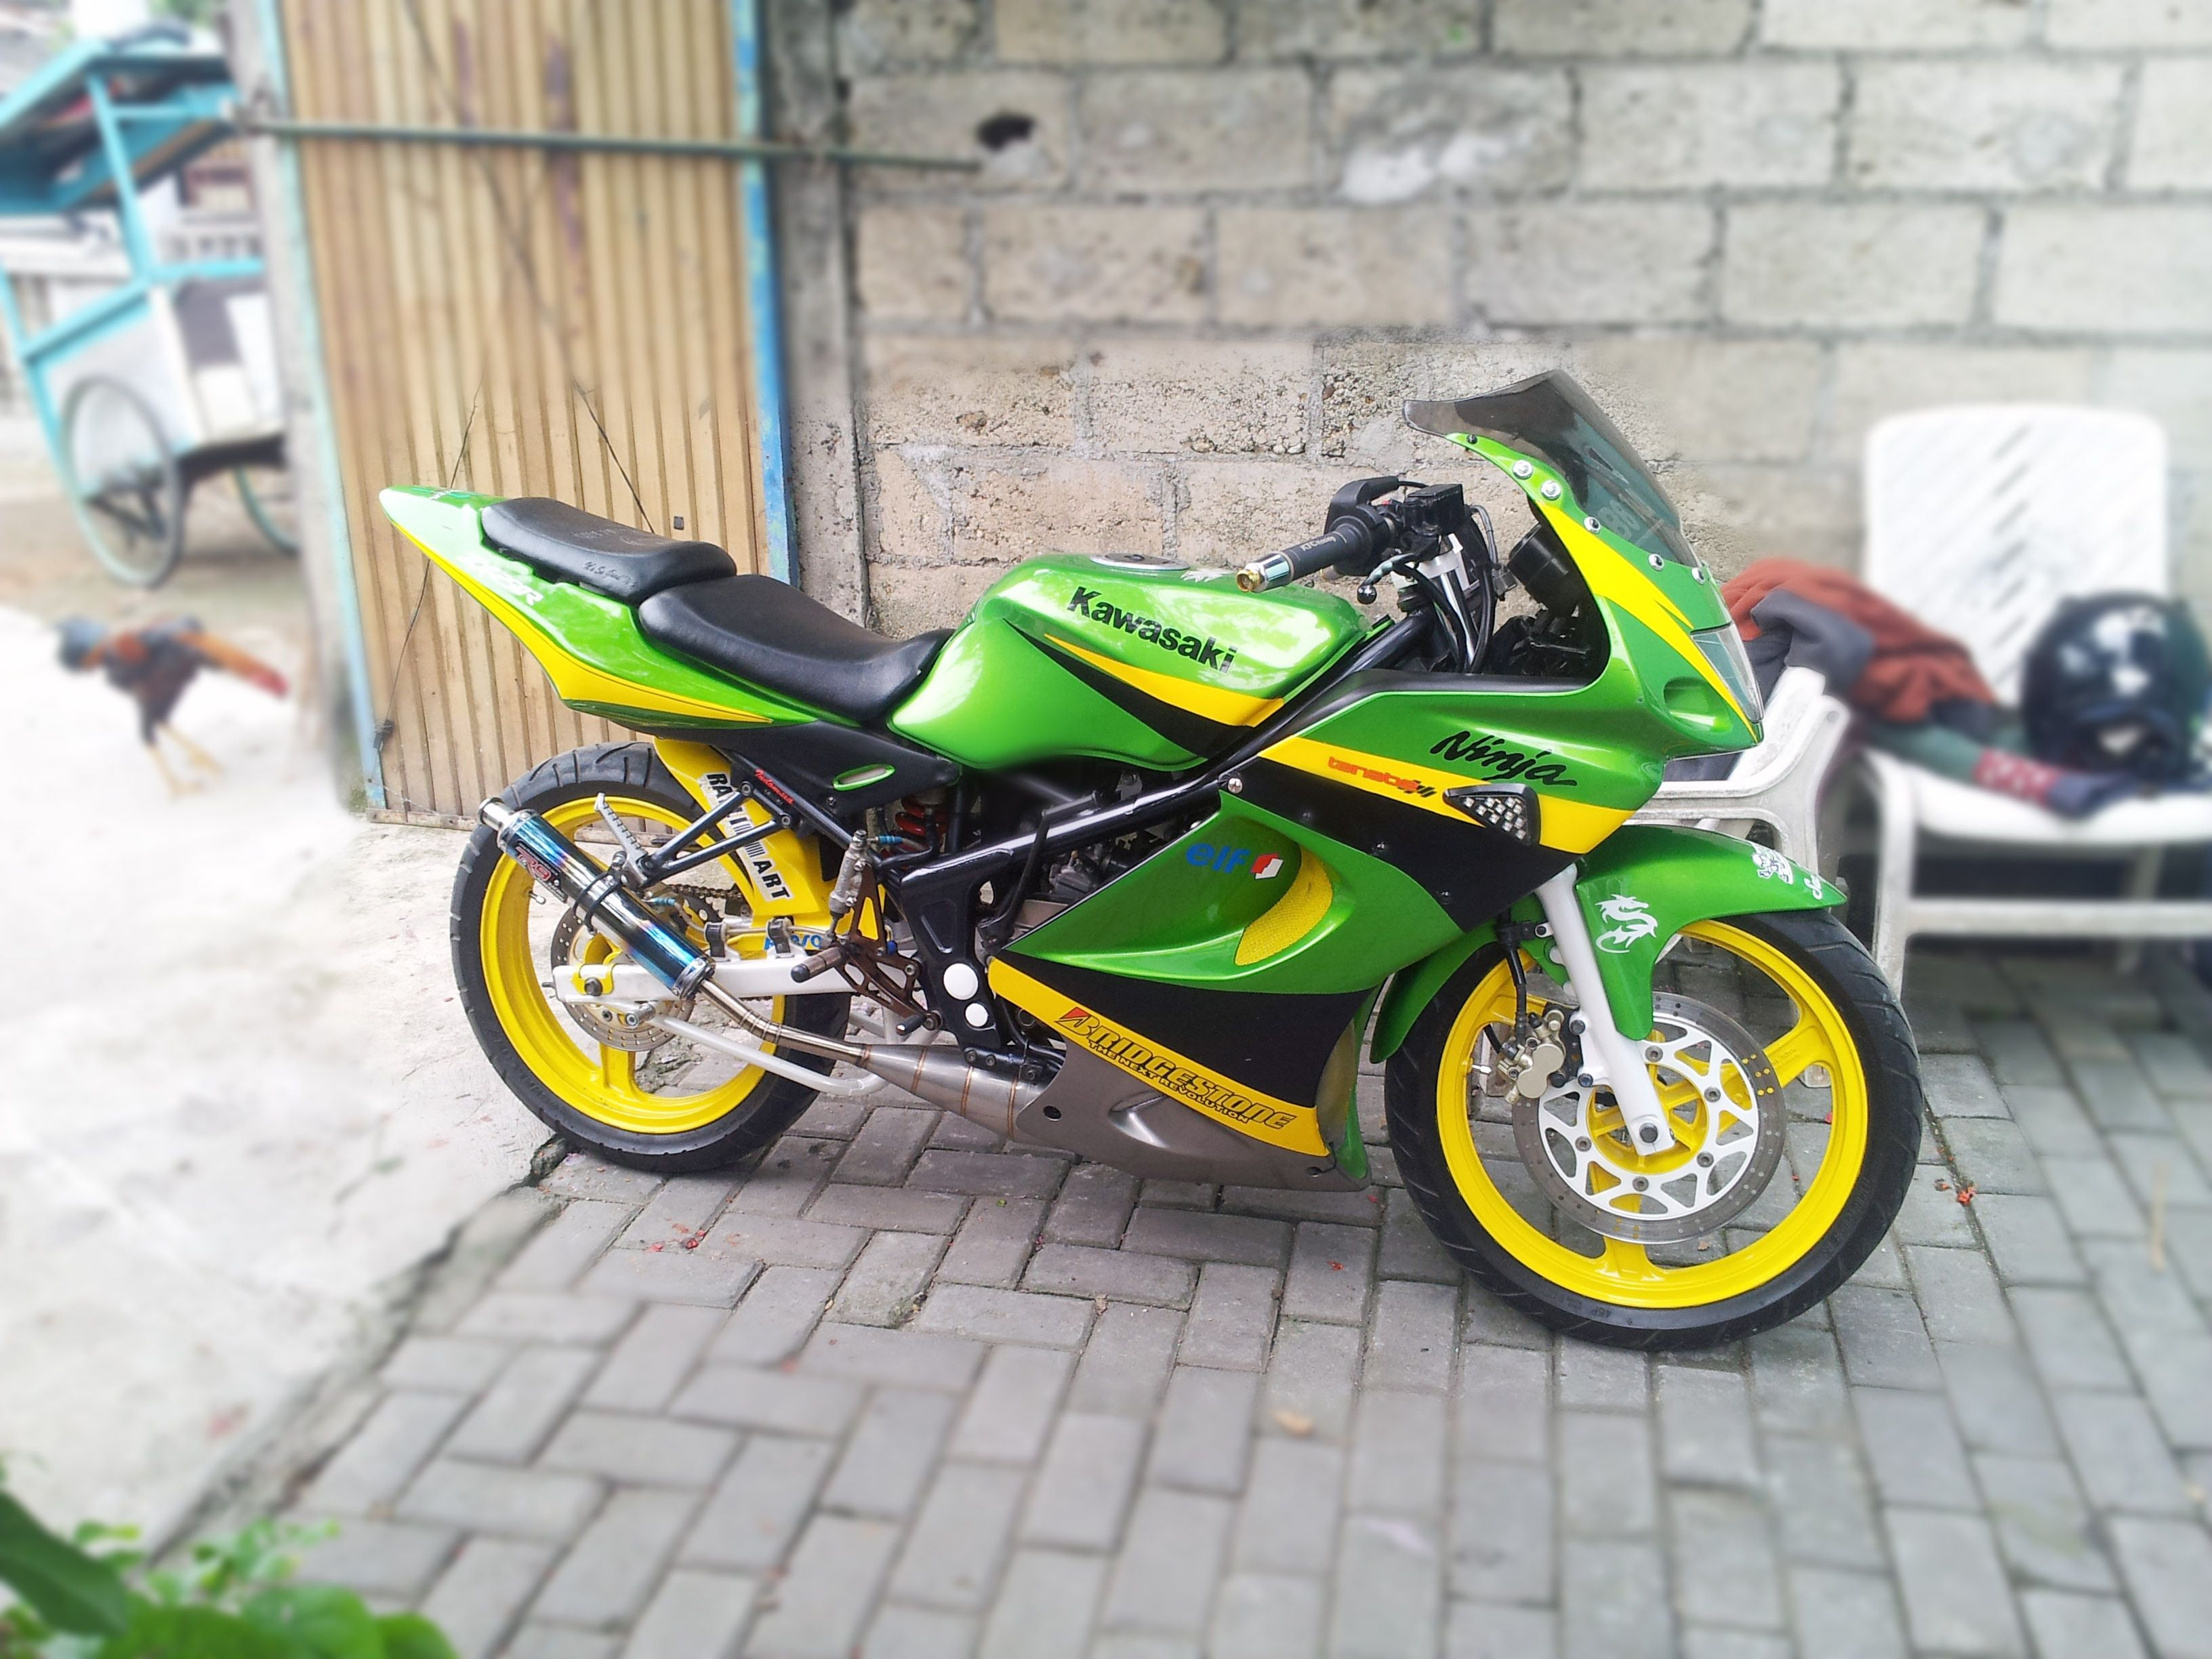 Kawasaki ninja RR hijau kuning Kawasaki ninja, Hijau, Ninja